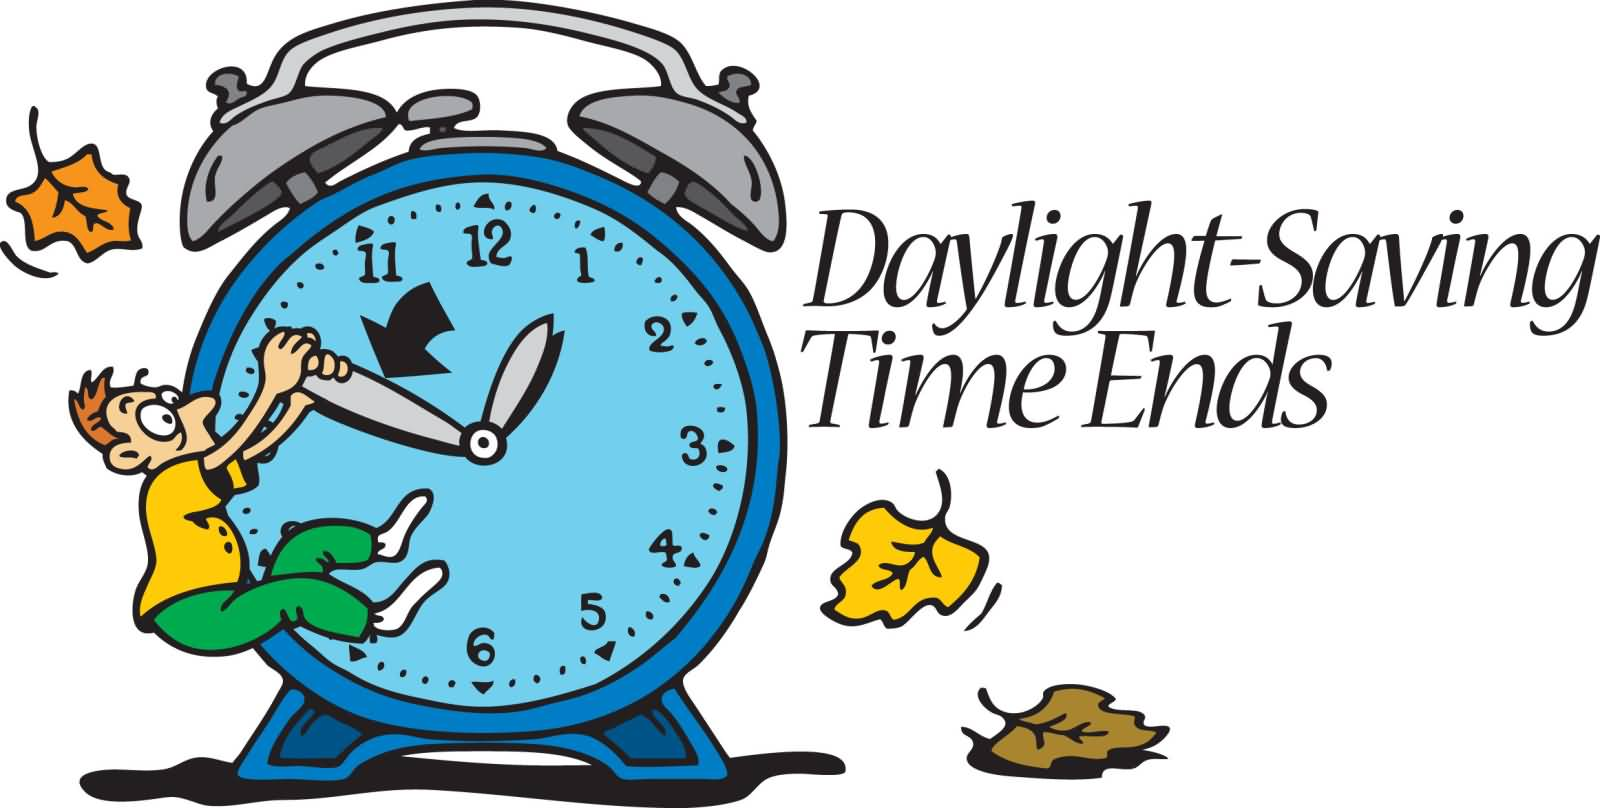 Daylight Saving Time Ends Illustration